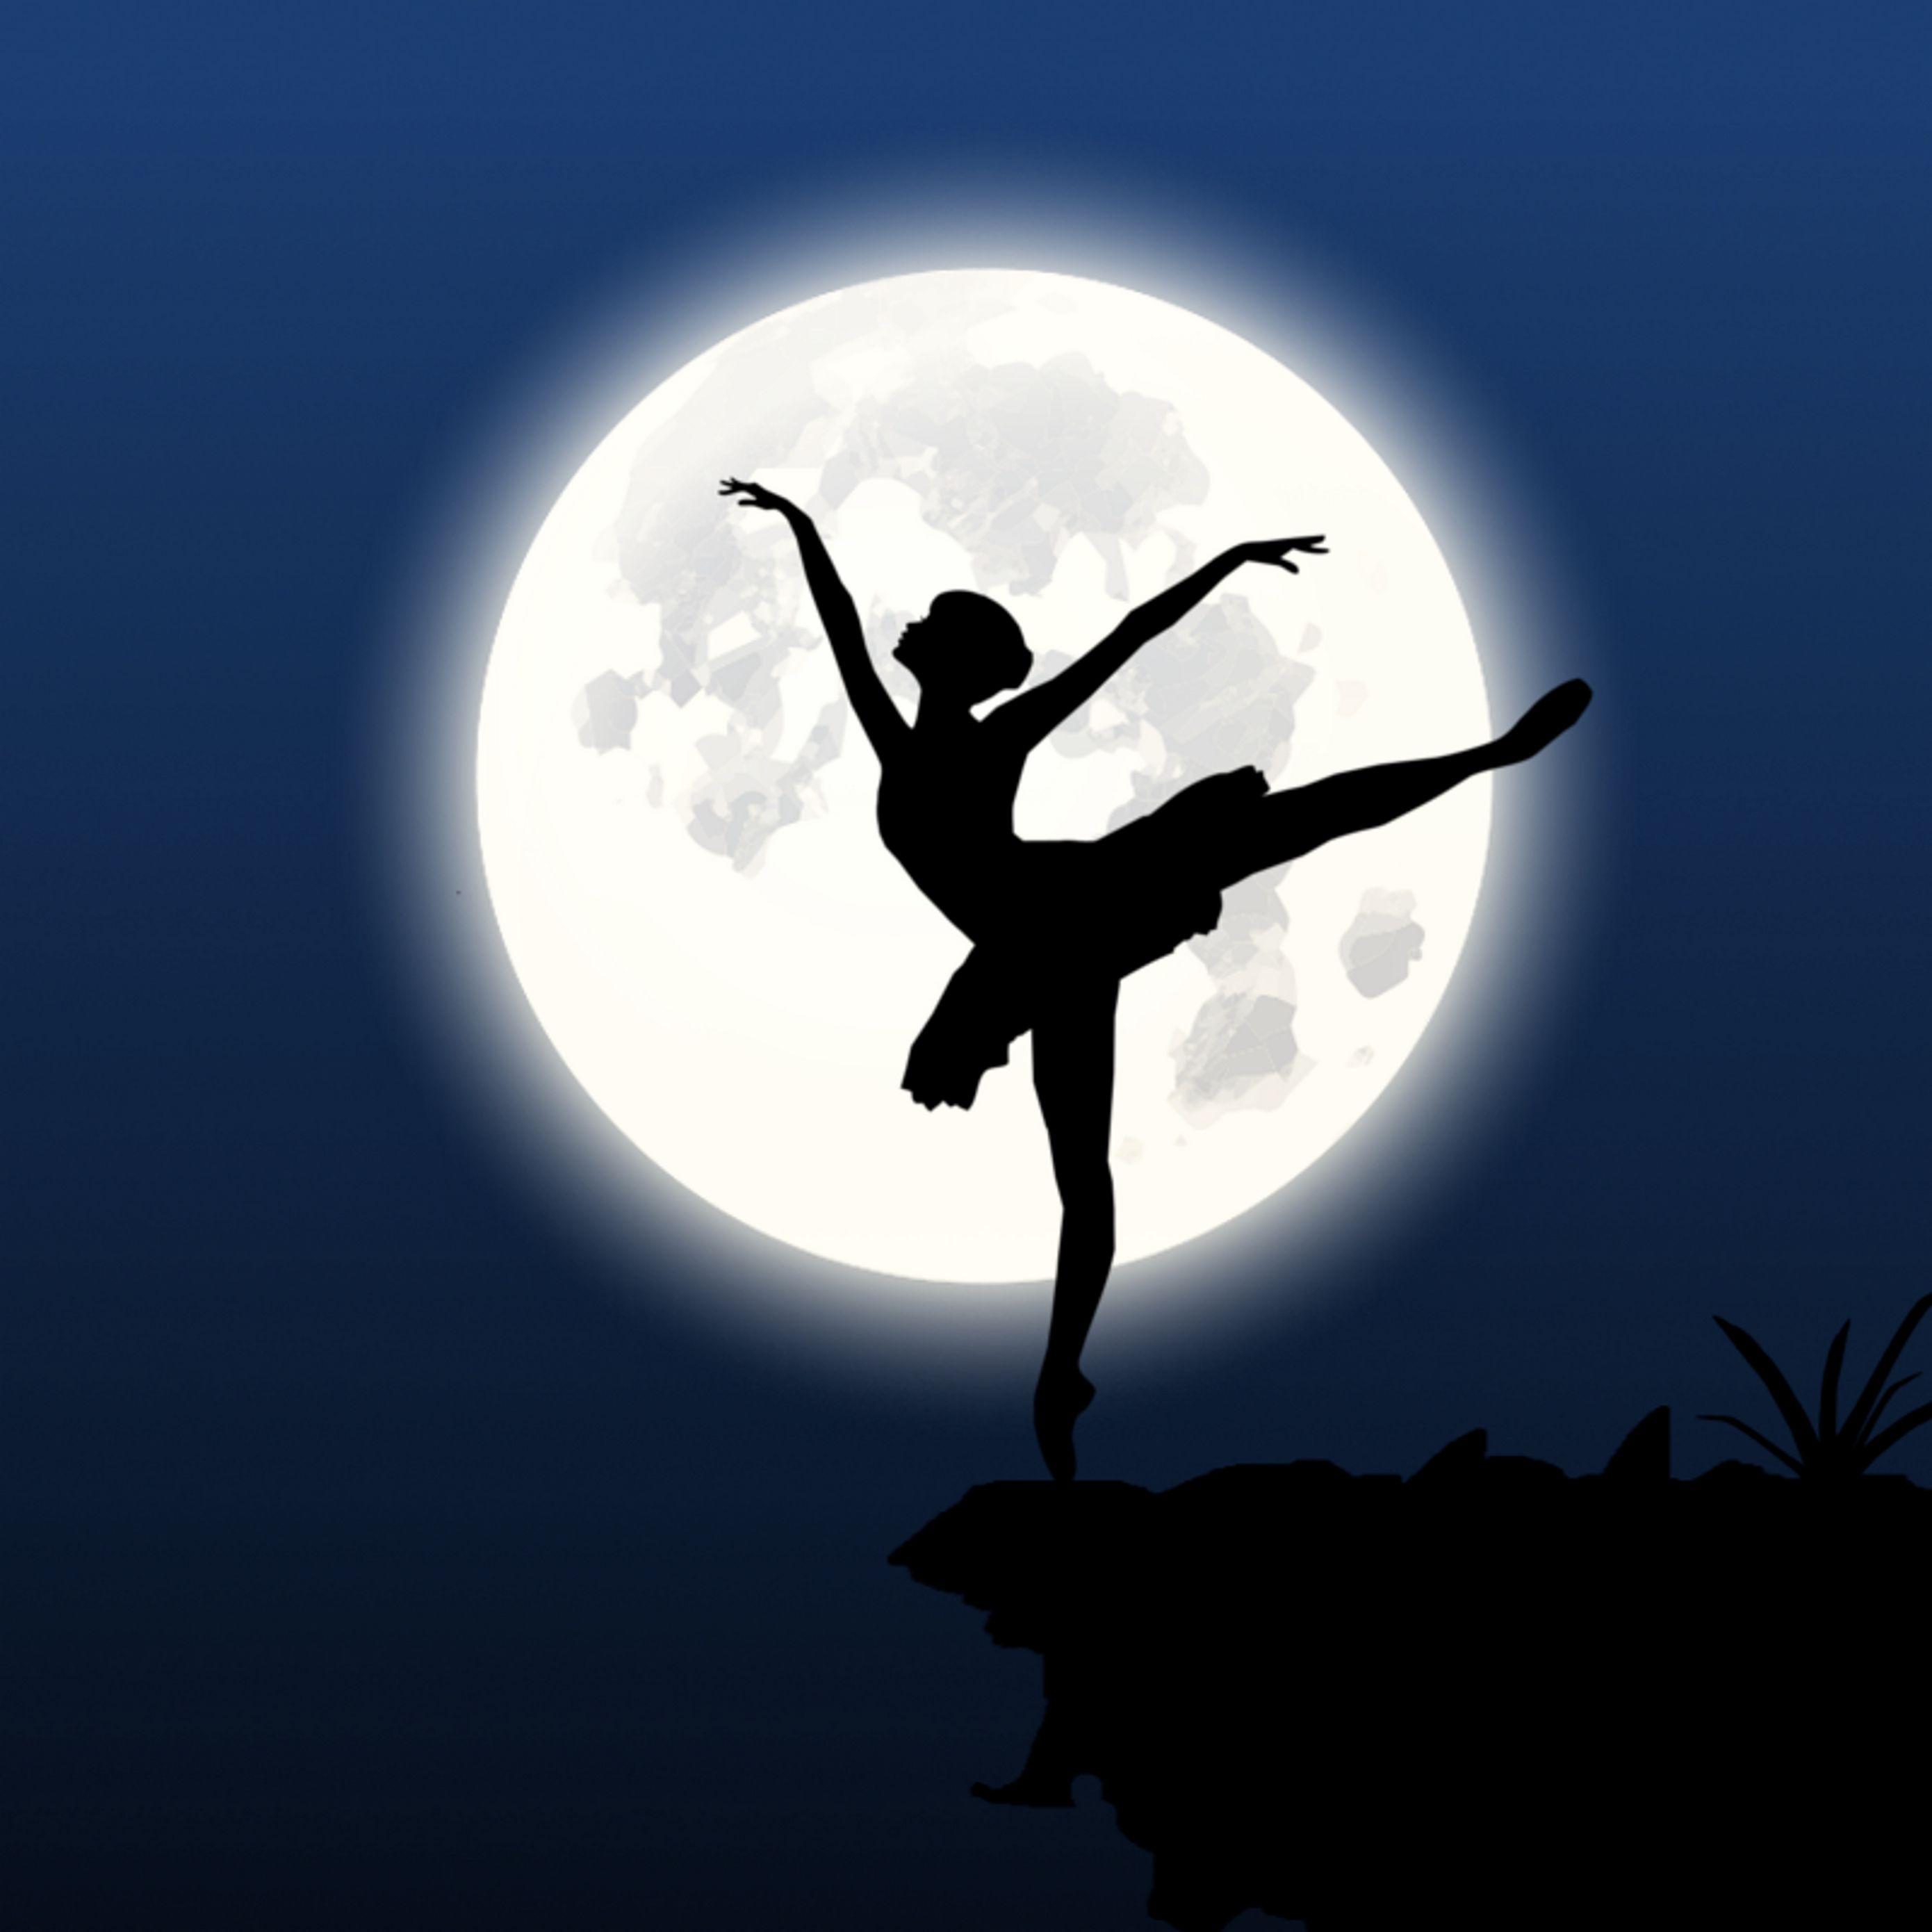 2780x2780 Wallpaper ballerina, silhouette, moon, dance